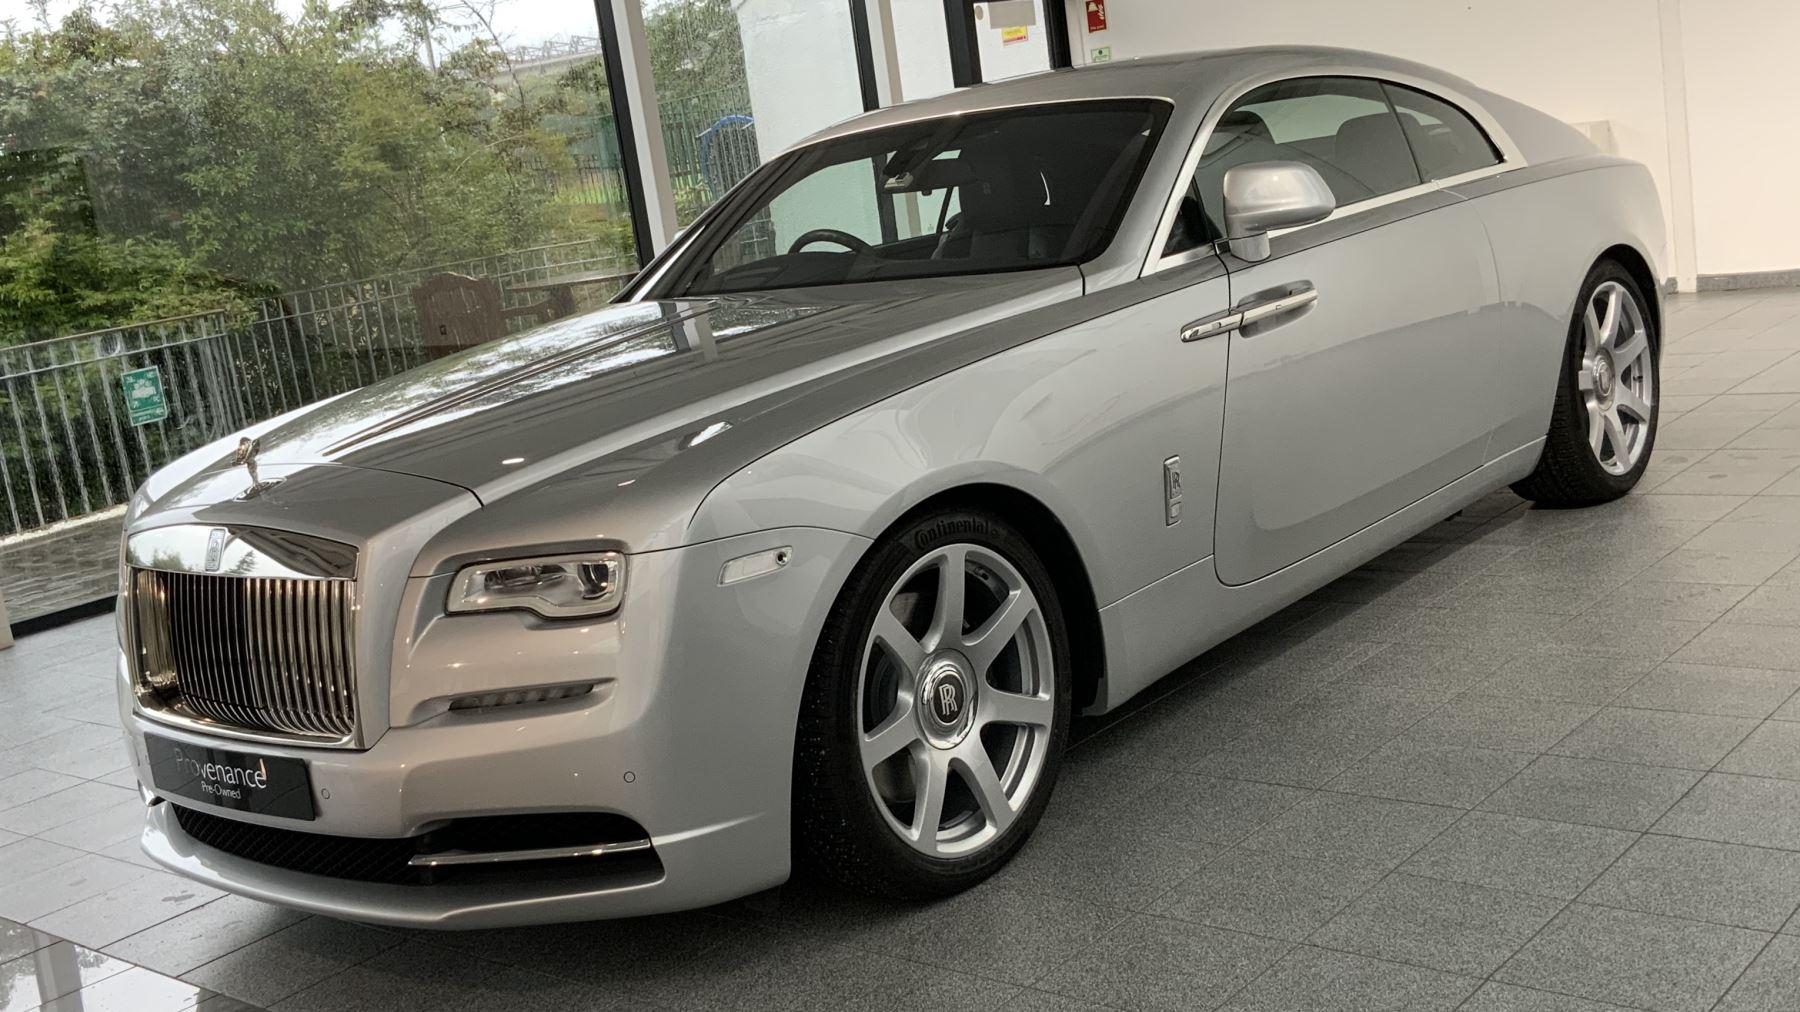 Rolls-Royce Wraith V12 image 7